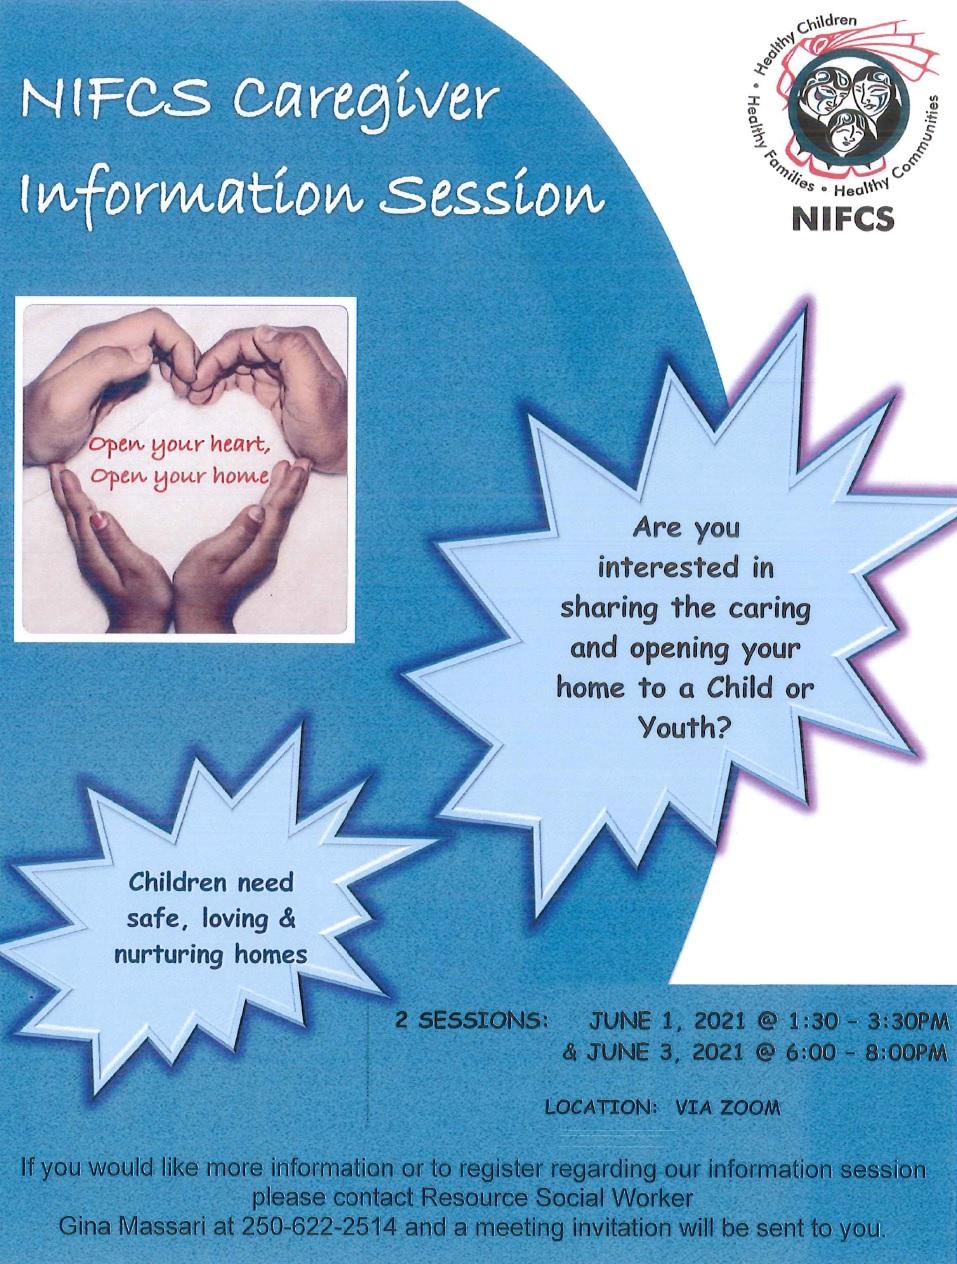 NIFCS Caregiver Information Sessions